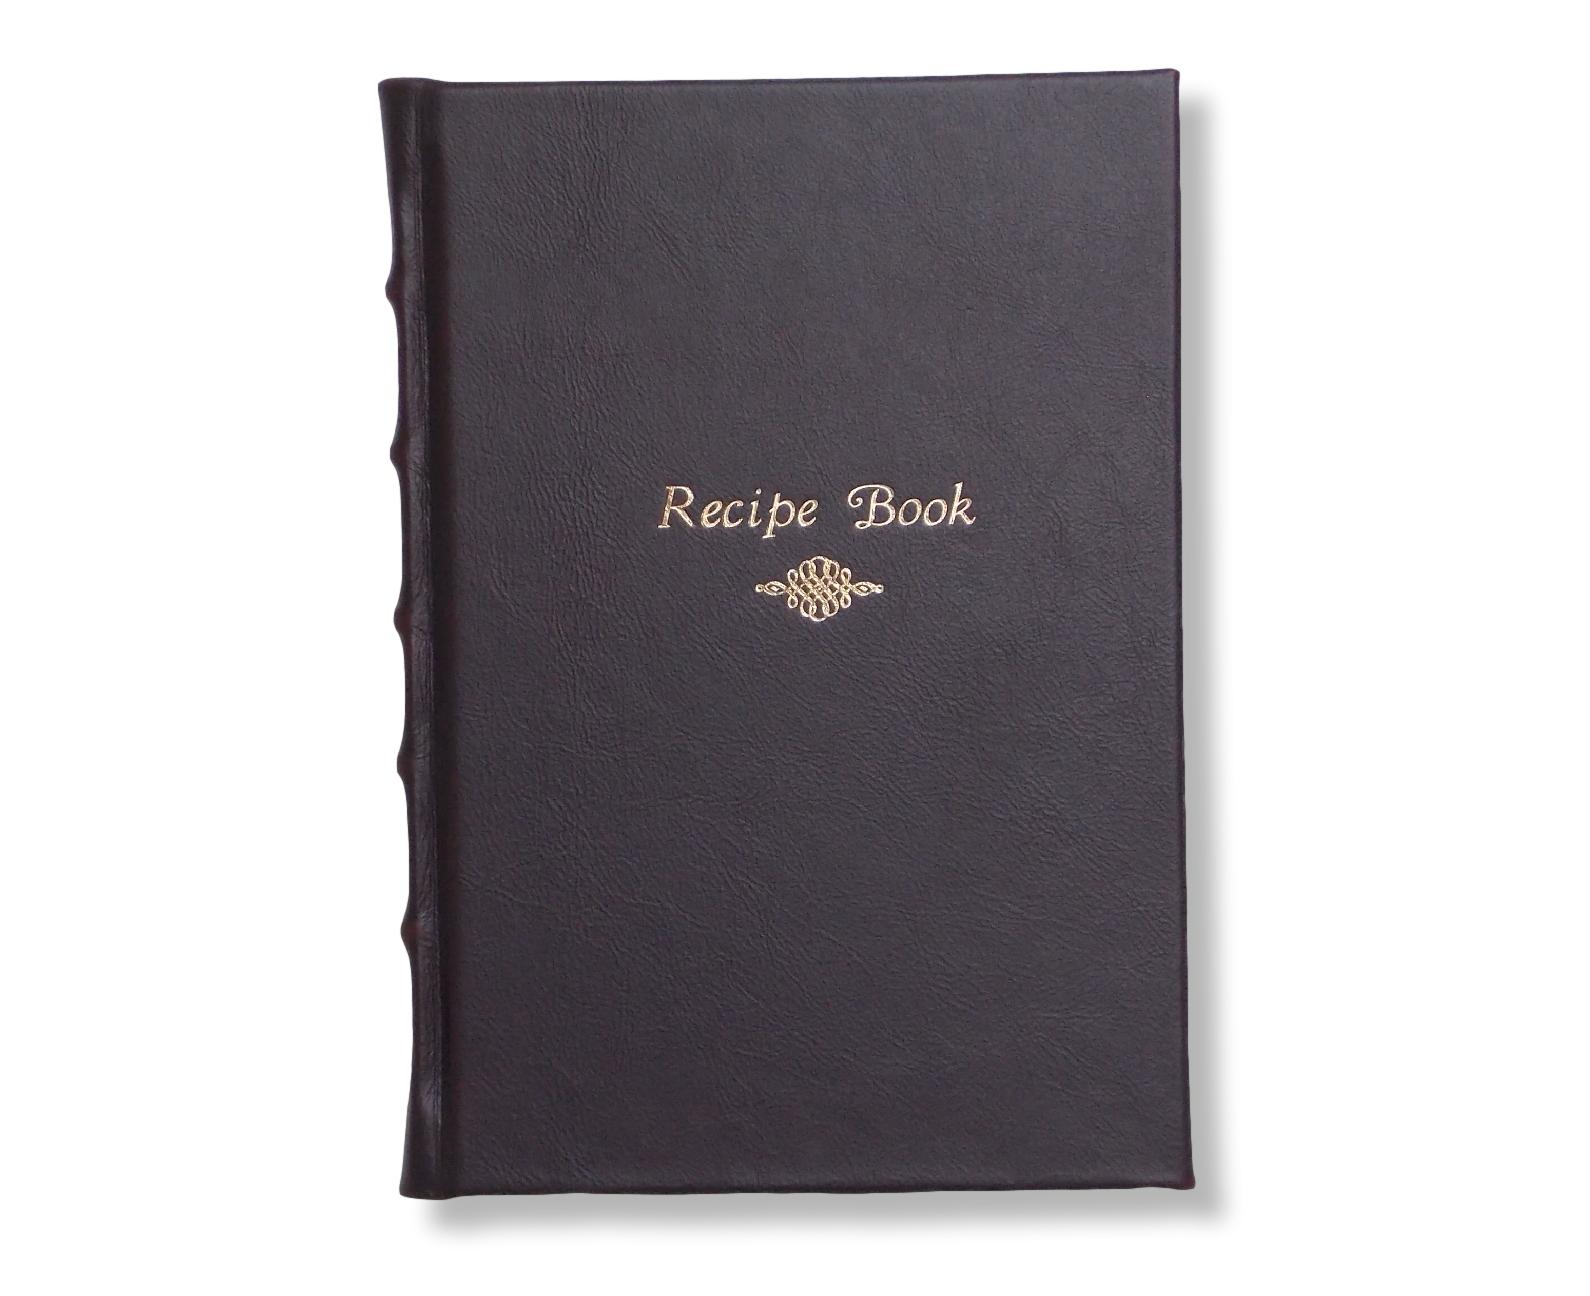 Full Leather Recipe Book in chocolate